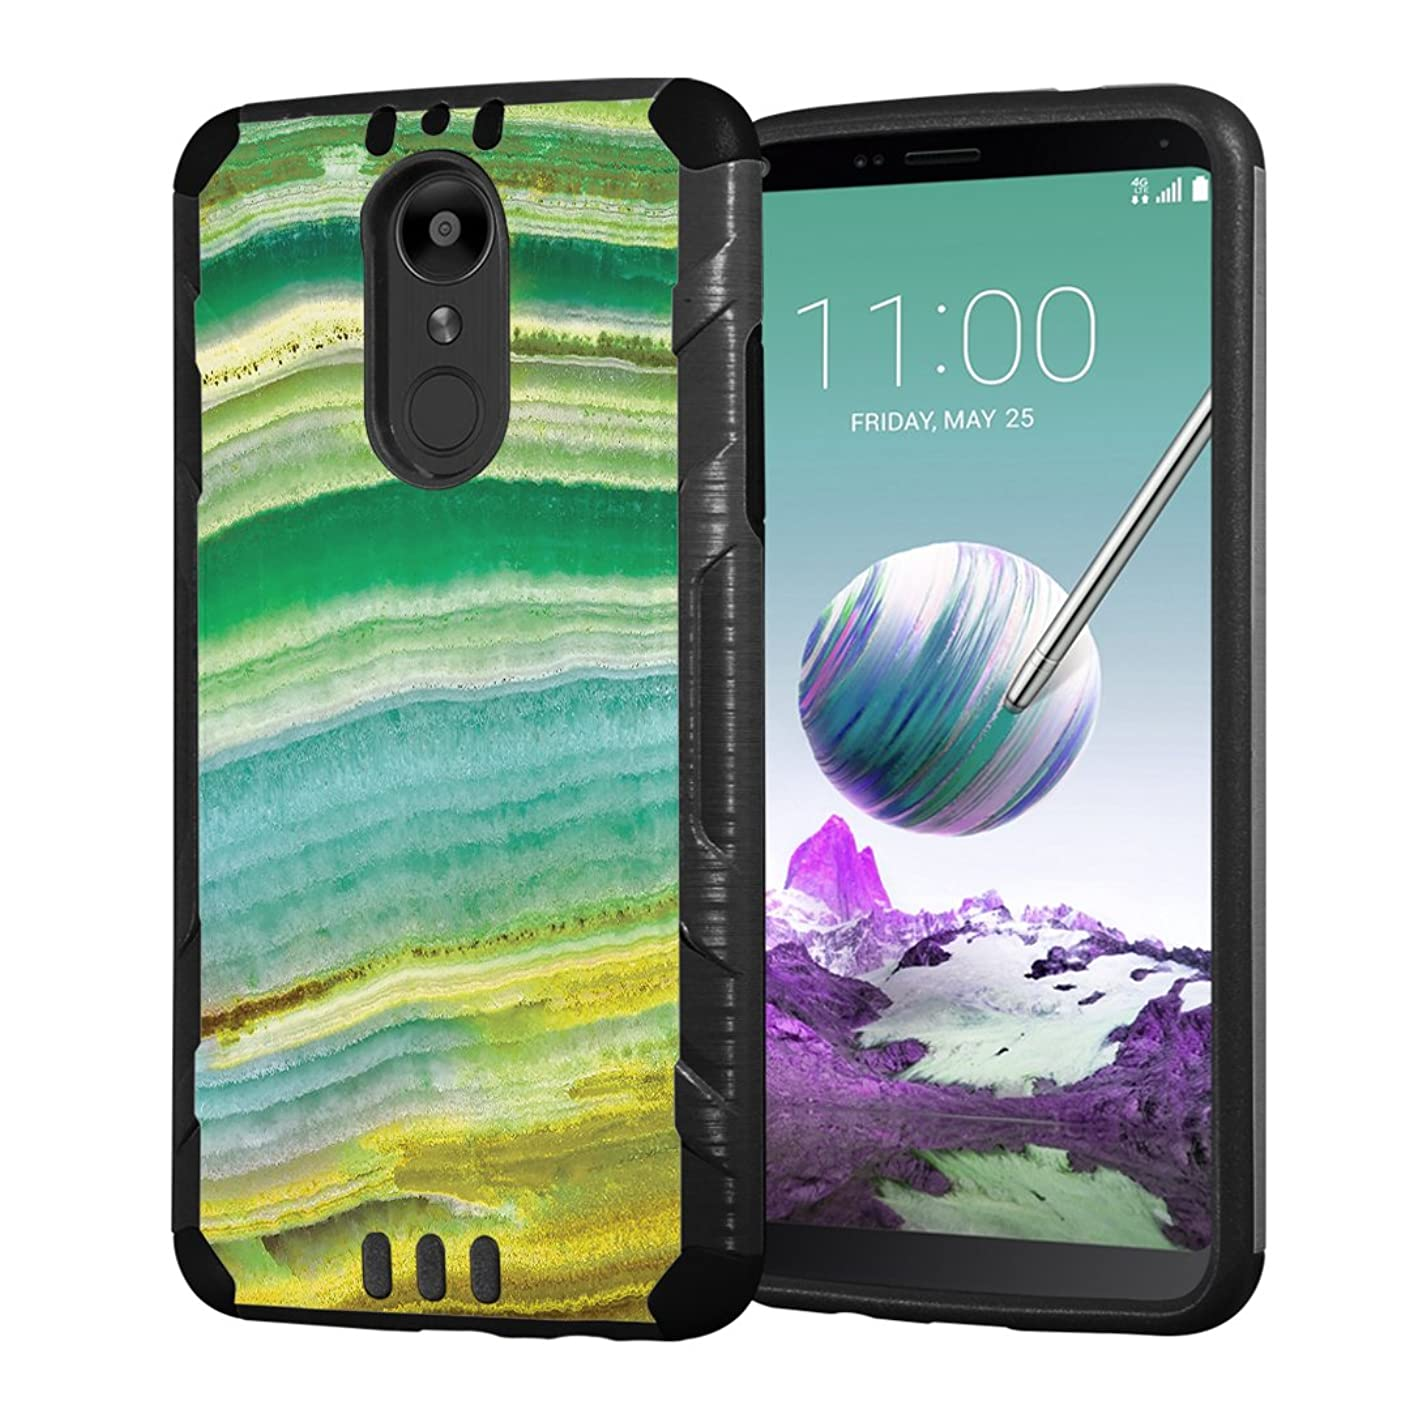 Moriko Case Compatible with LG Stylo 4 Plus, LG Stylo 4, LG Q Stylus [Armor Layer Drop Protection Slim Fashion Shockproof Black Case] for LG Stylo 4 - (Green Quartz)